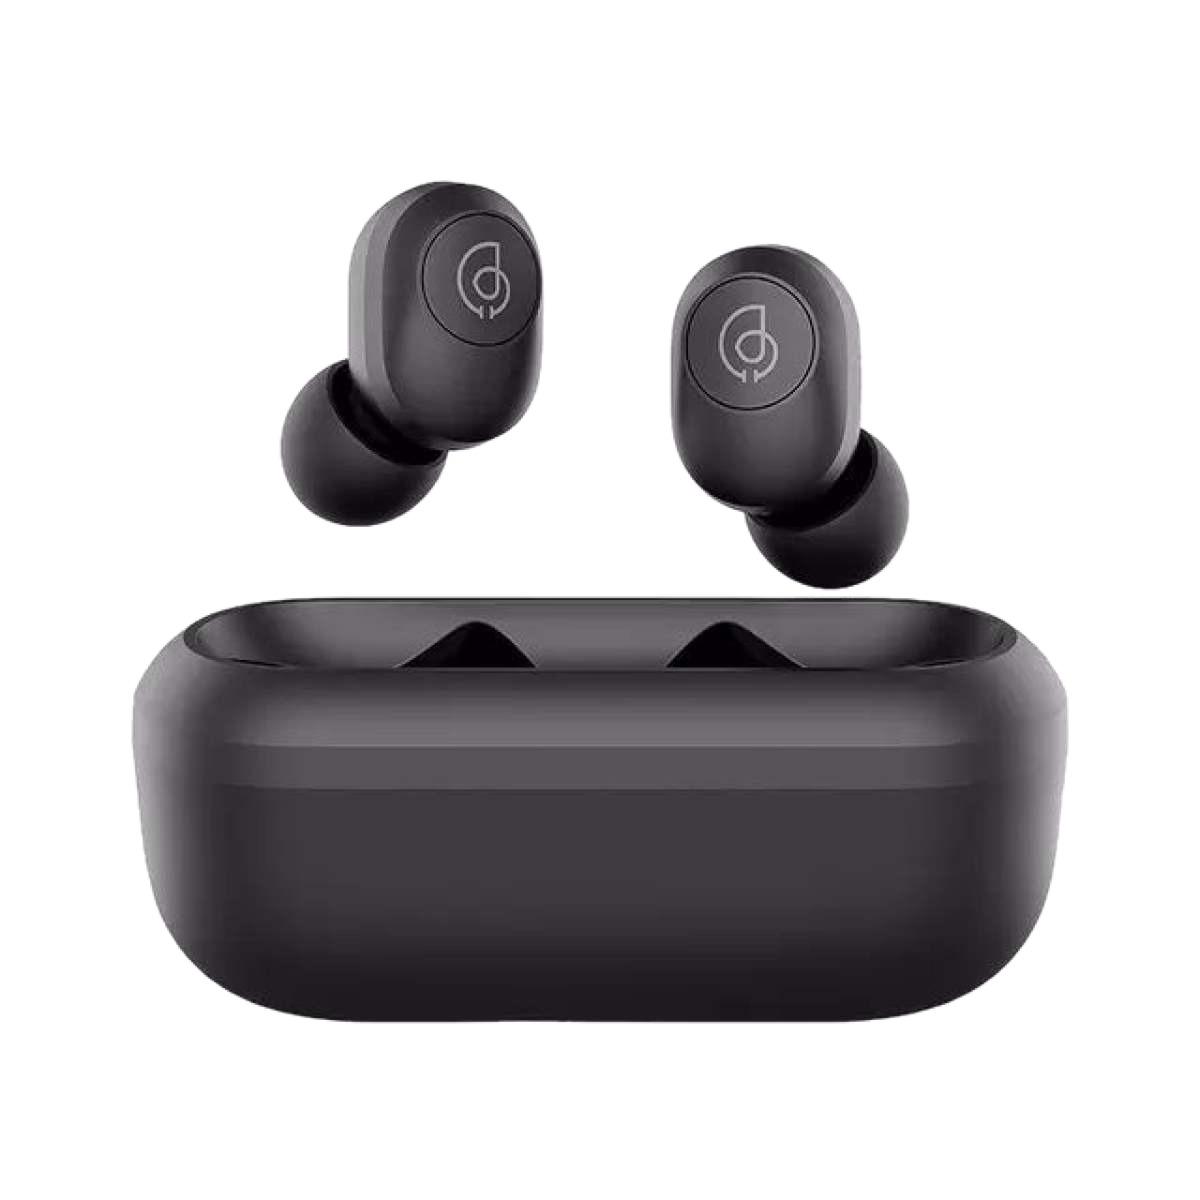 Xiaomi Haylou Gt2 Tws Bluetooth Earbuds Black Buy Online At Best Prices In Bangladesh Daraz Com Bd